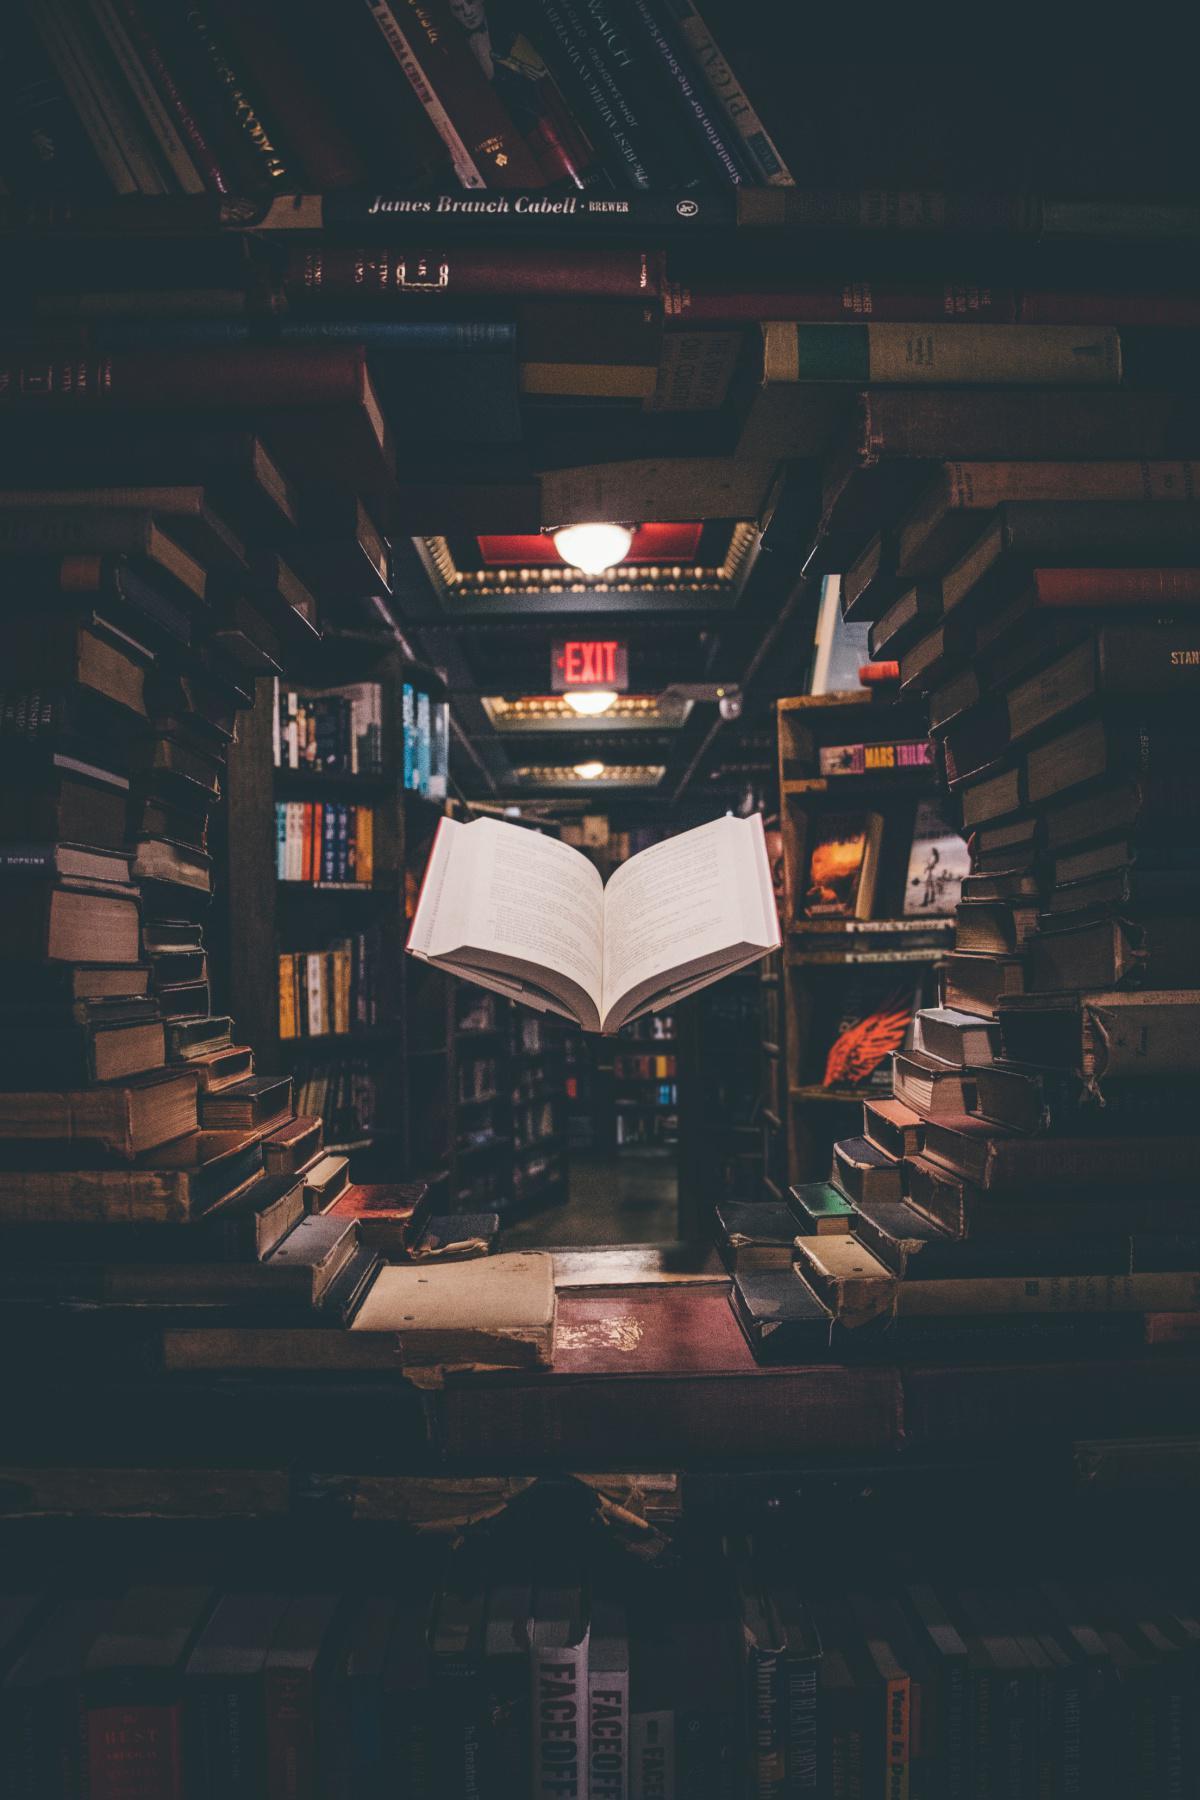 Convocatoria a comunidades afrocolombianas para crear o fortalecer sus bibliotecas públicas